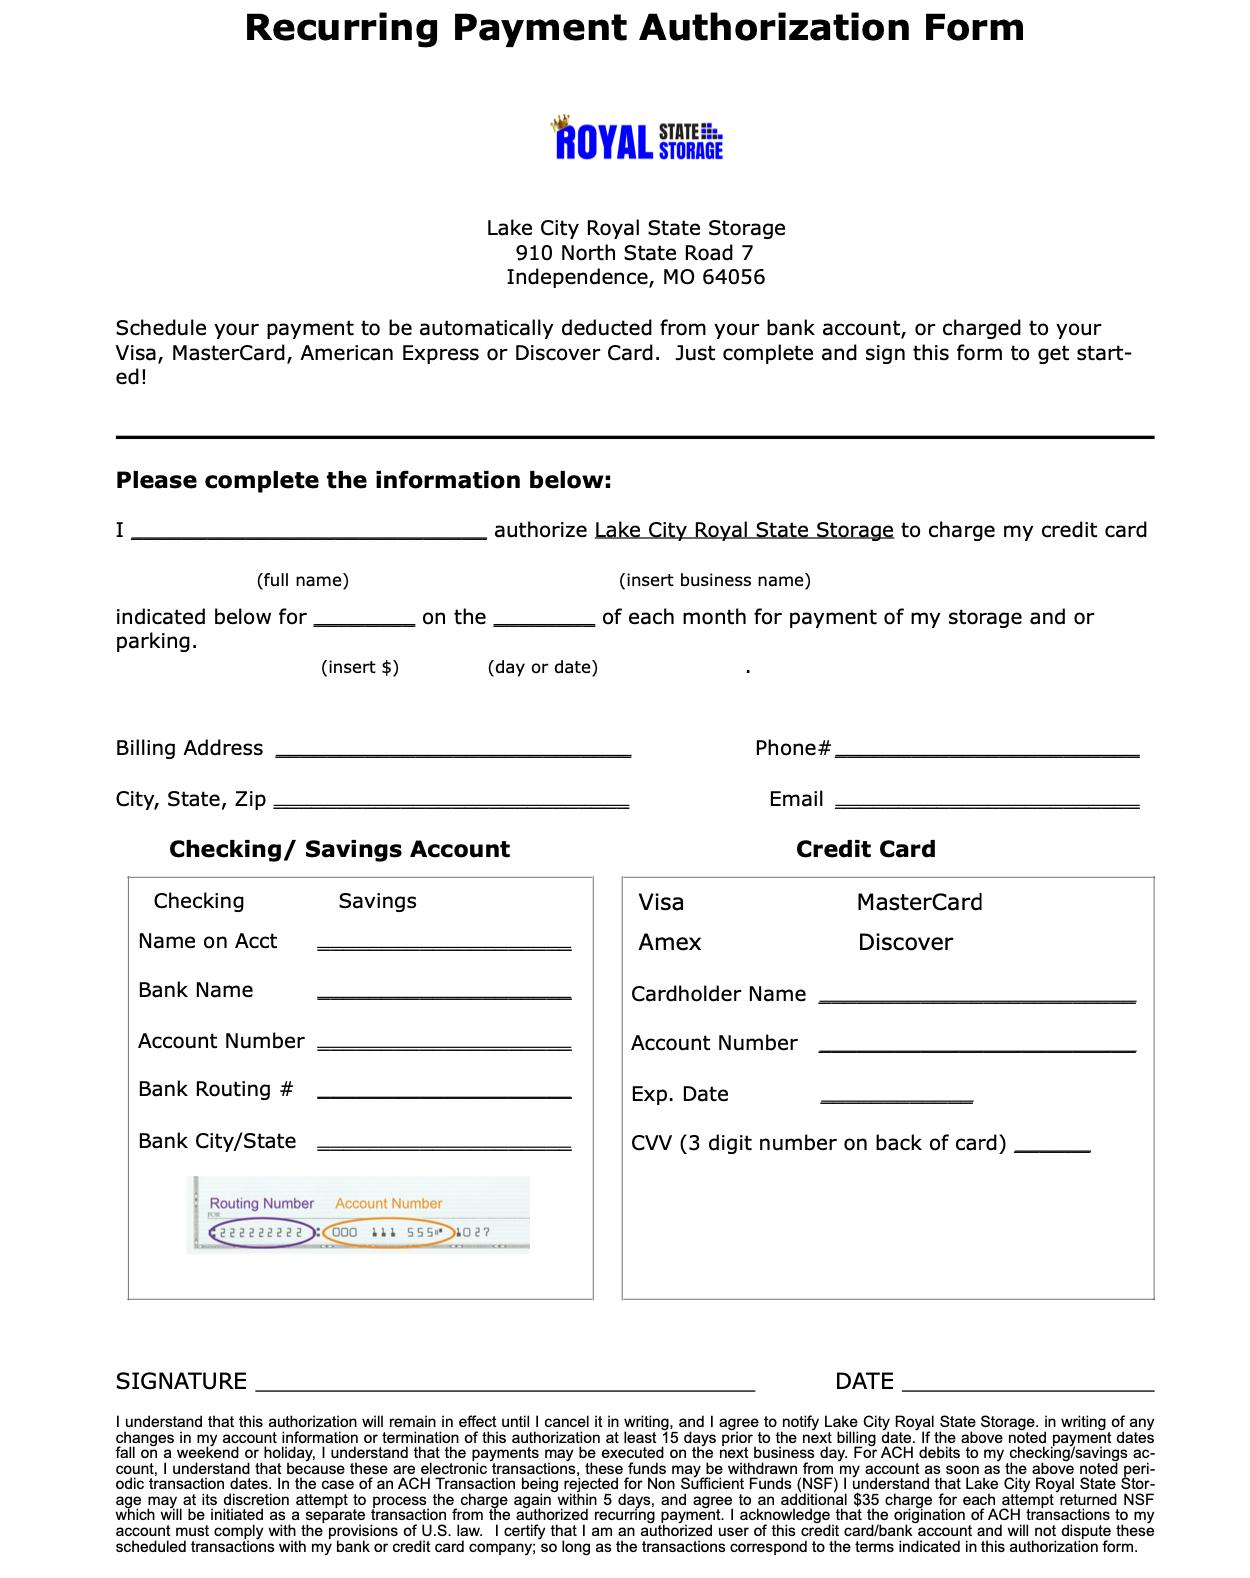 Royal State Storage ACH Form